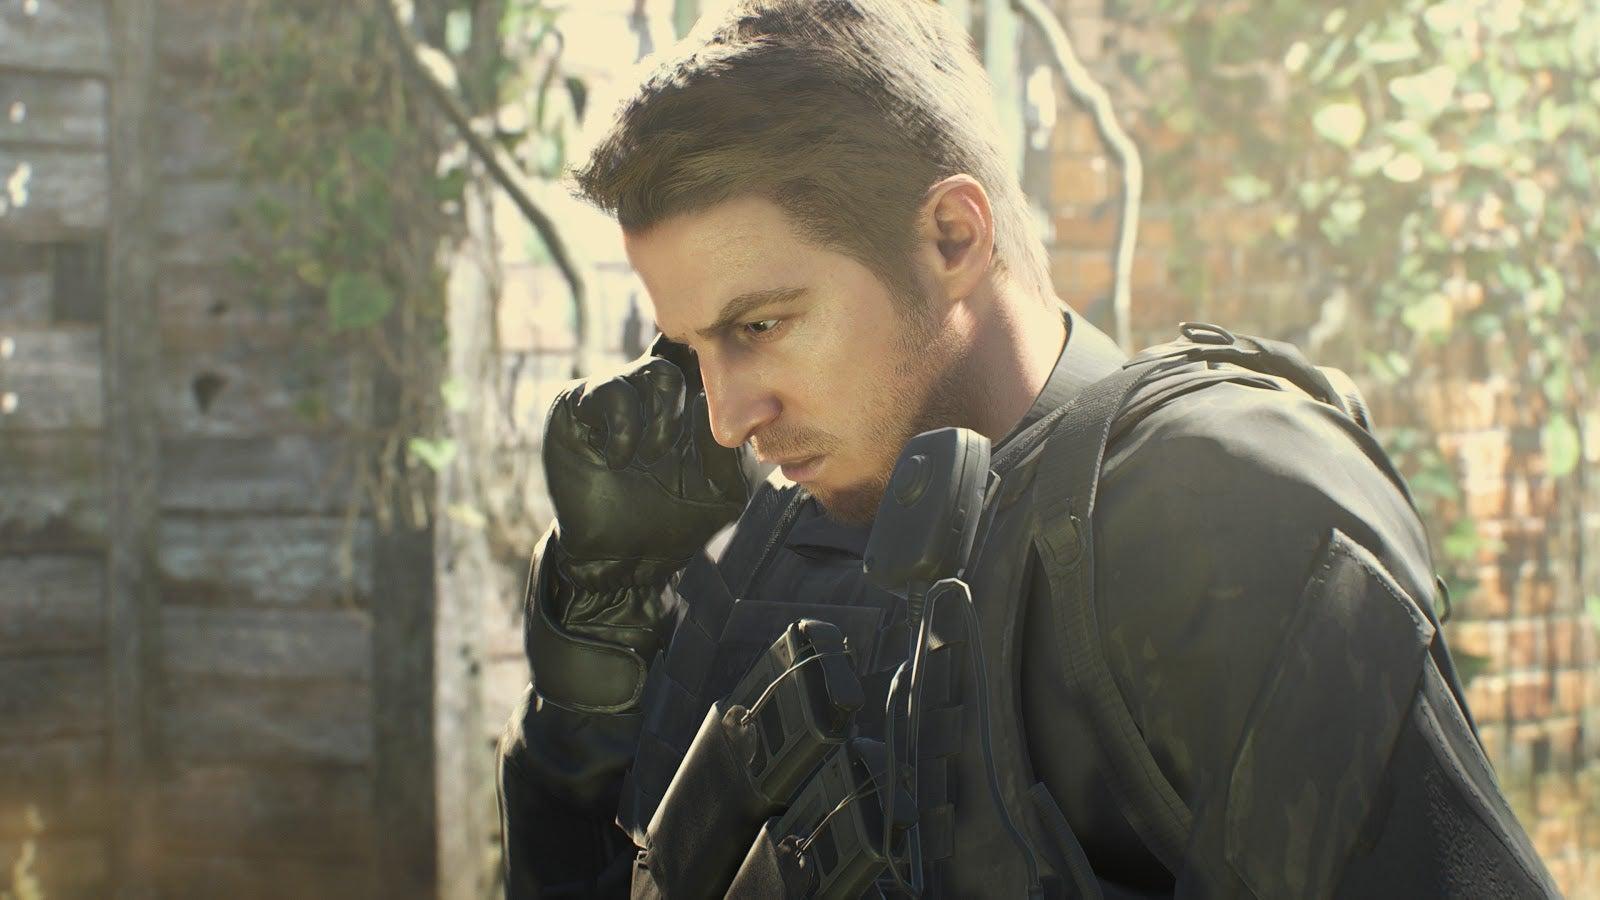 Resident Evil 7's New DLC Drops The Horror For Action